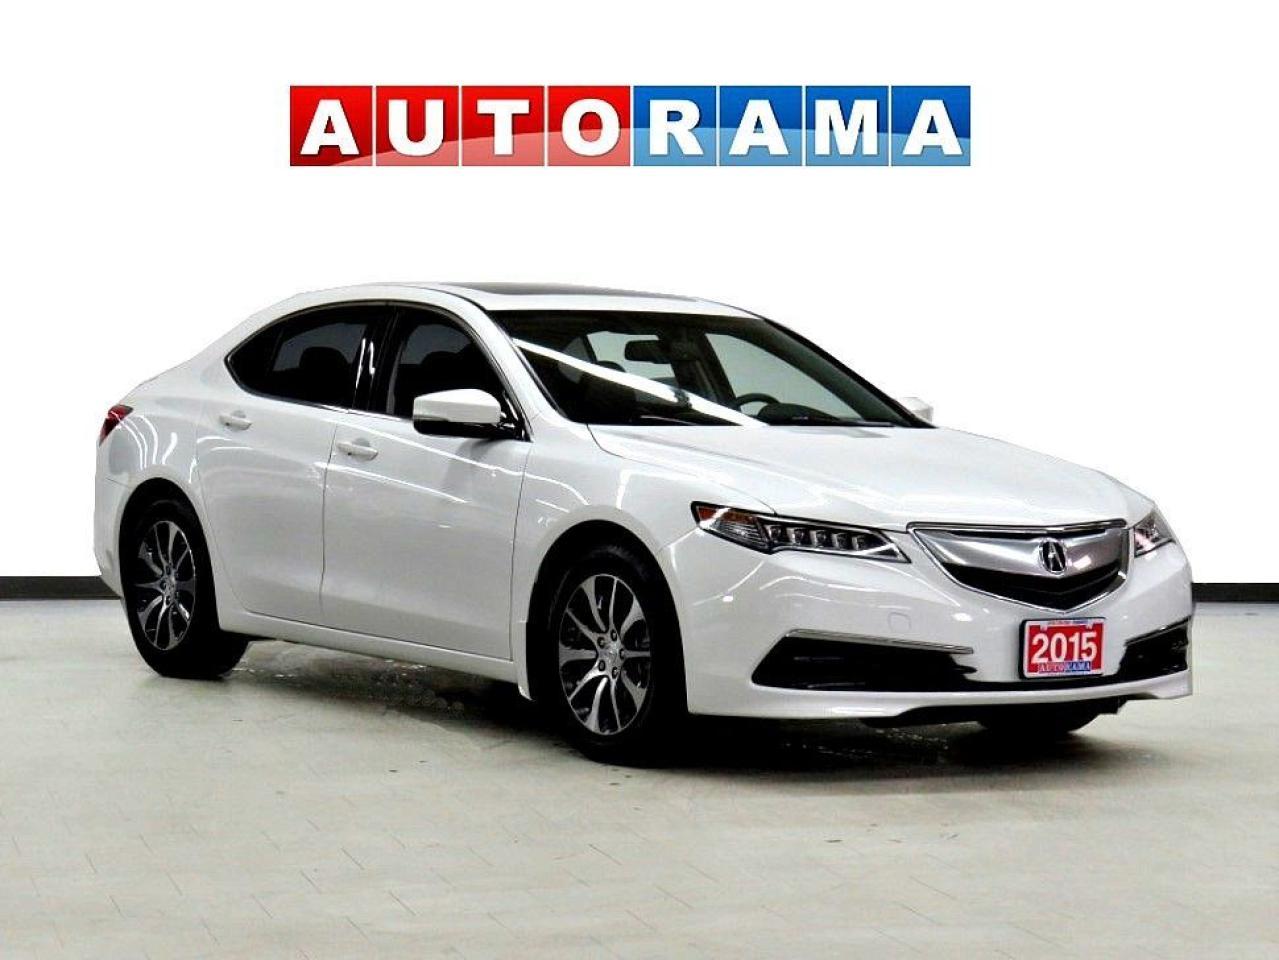 2015 Acura TLX V6 TECHNOLOGY PKG NAVIGATION LEATHER